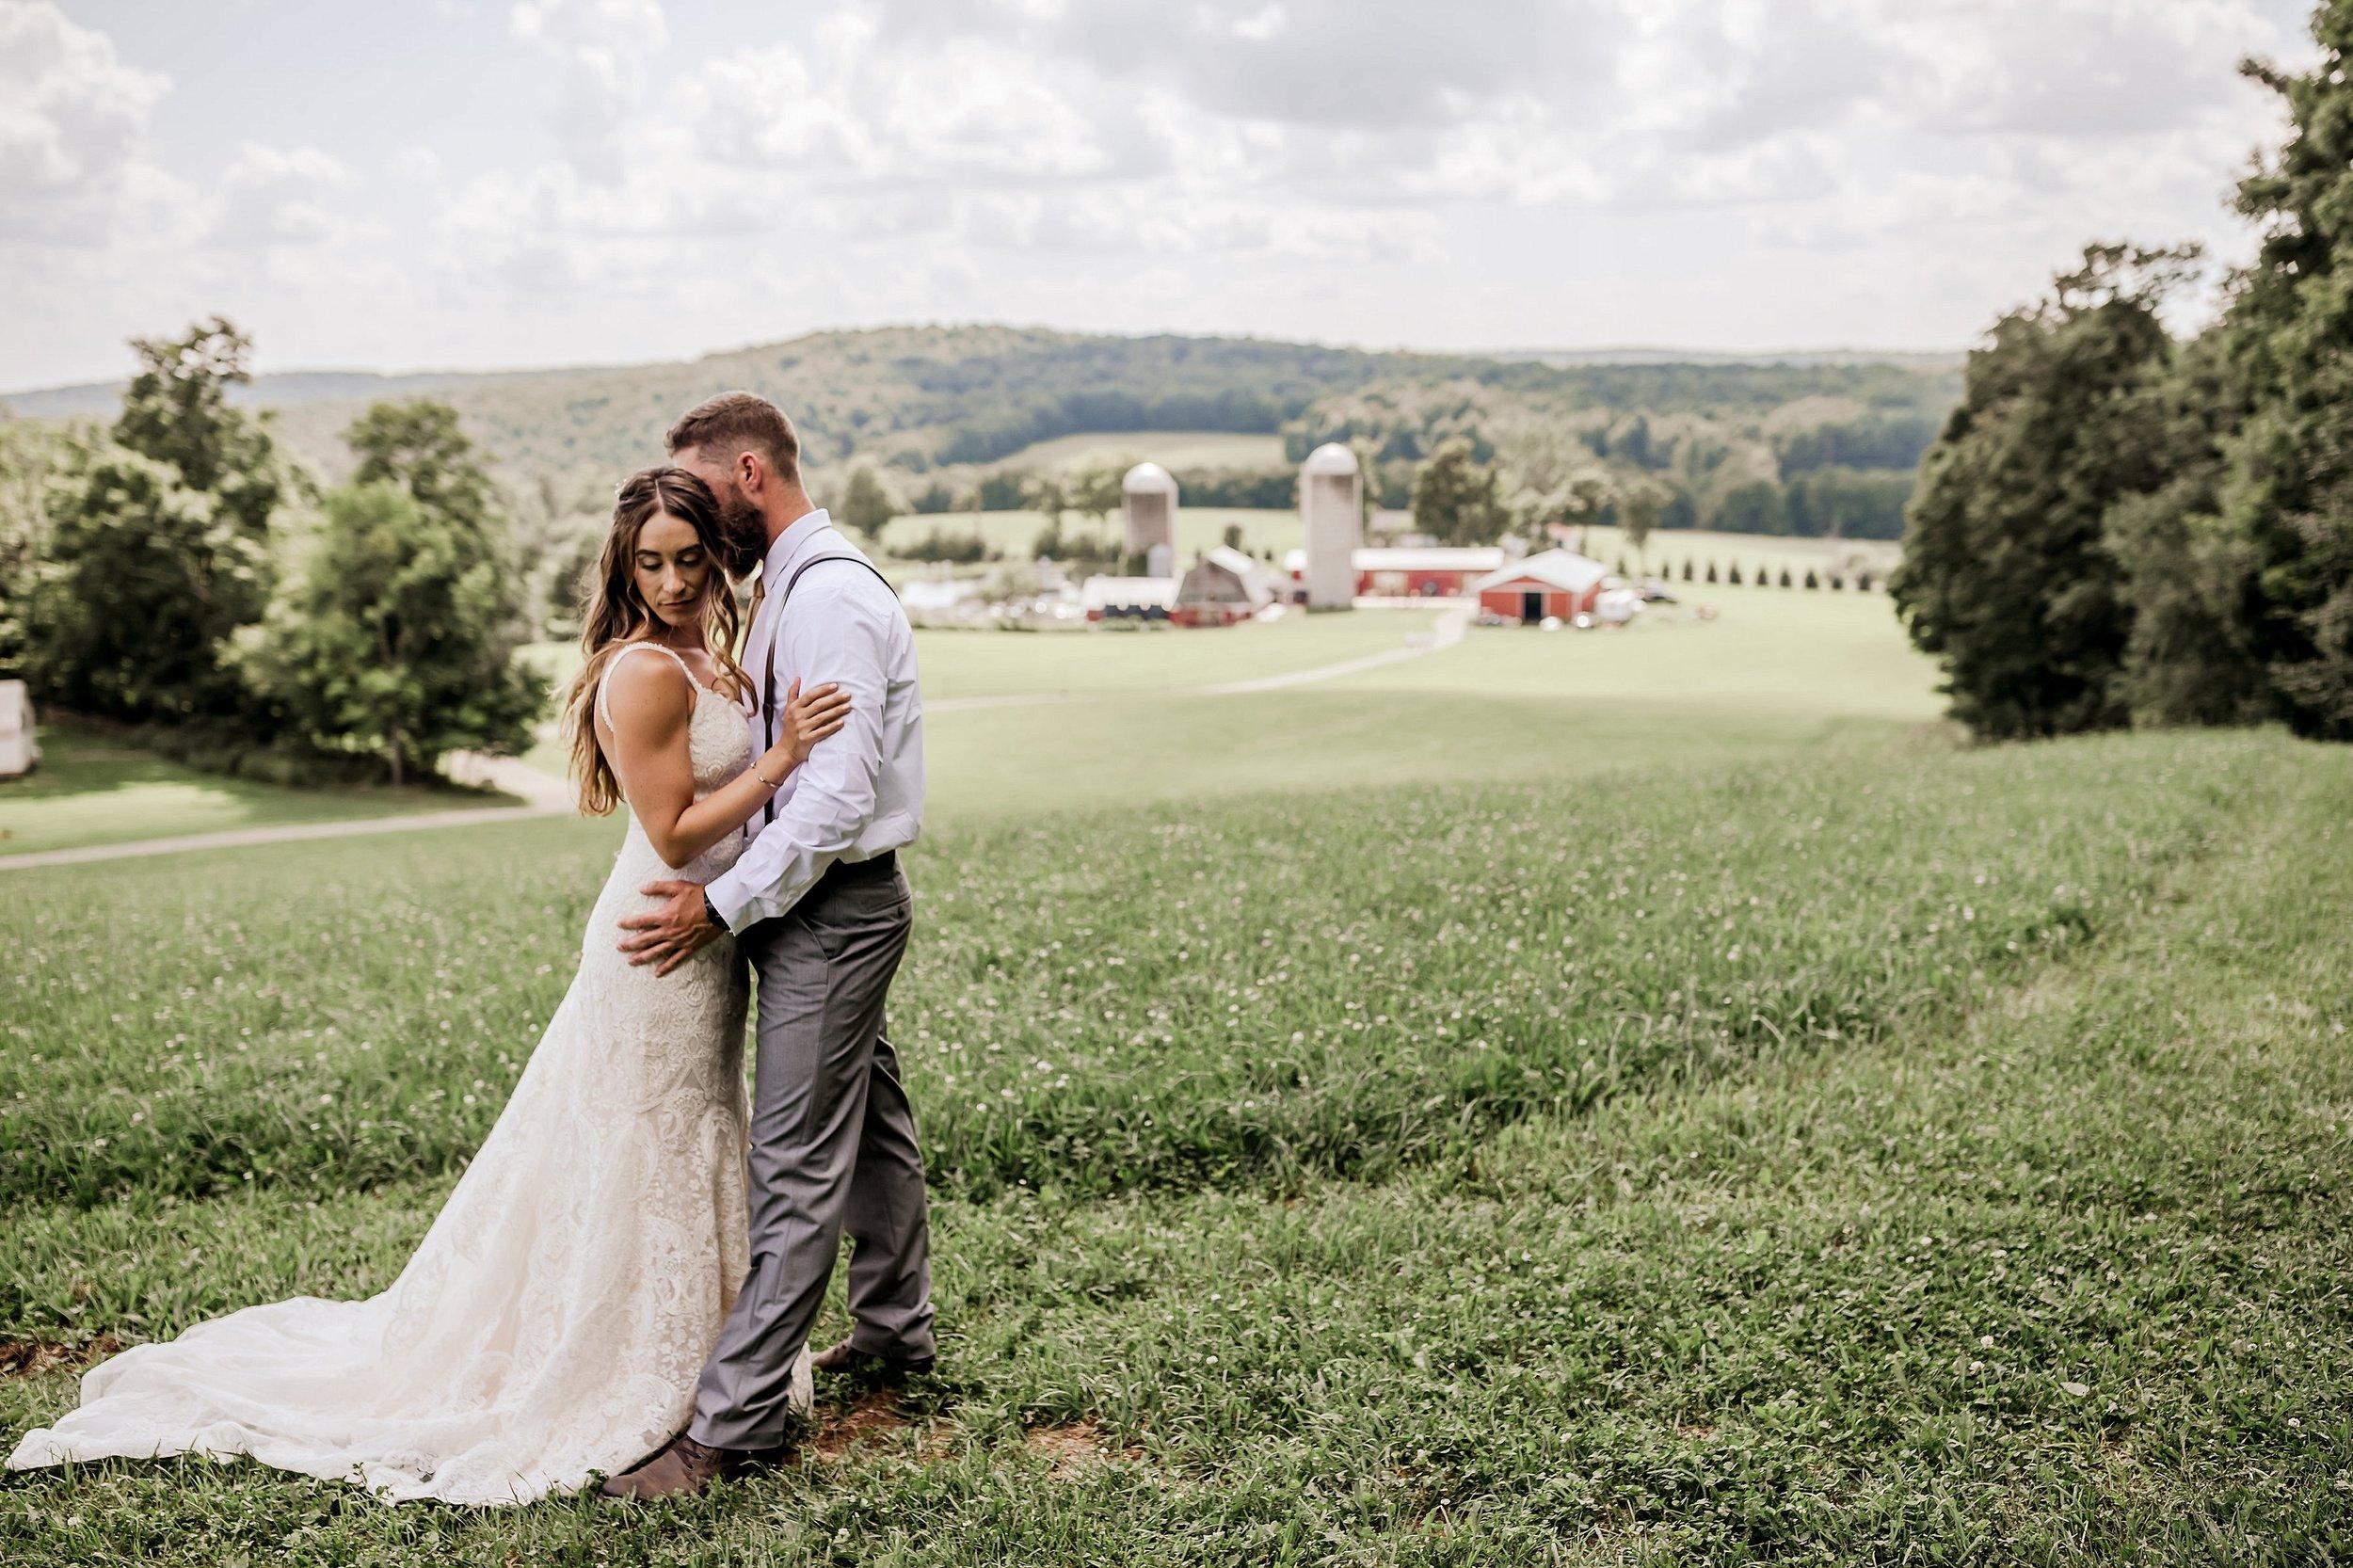 Gilbertsville-Farmhouse-Wedding-Photographer_0002.jpg